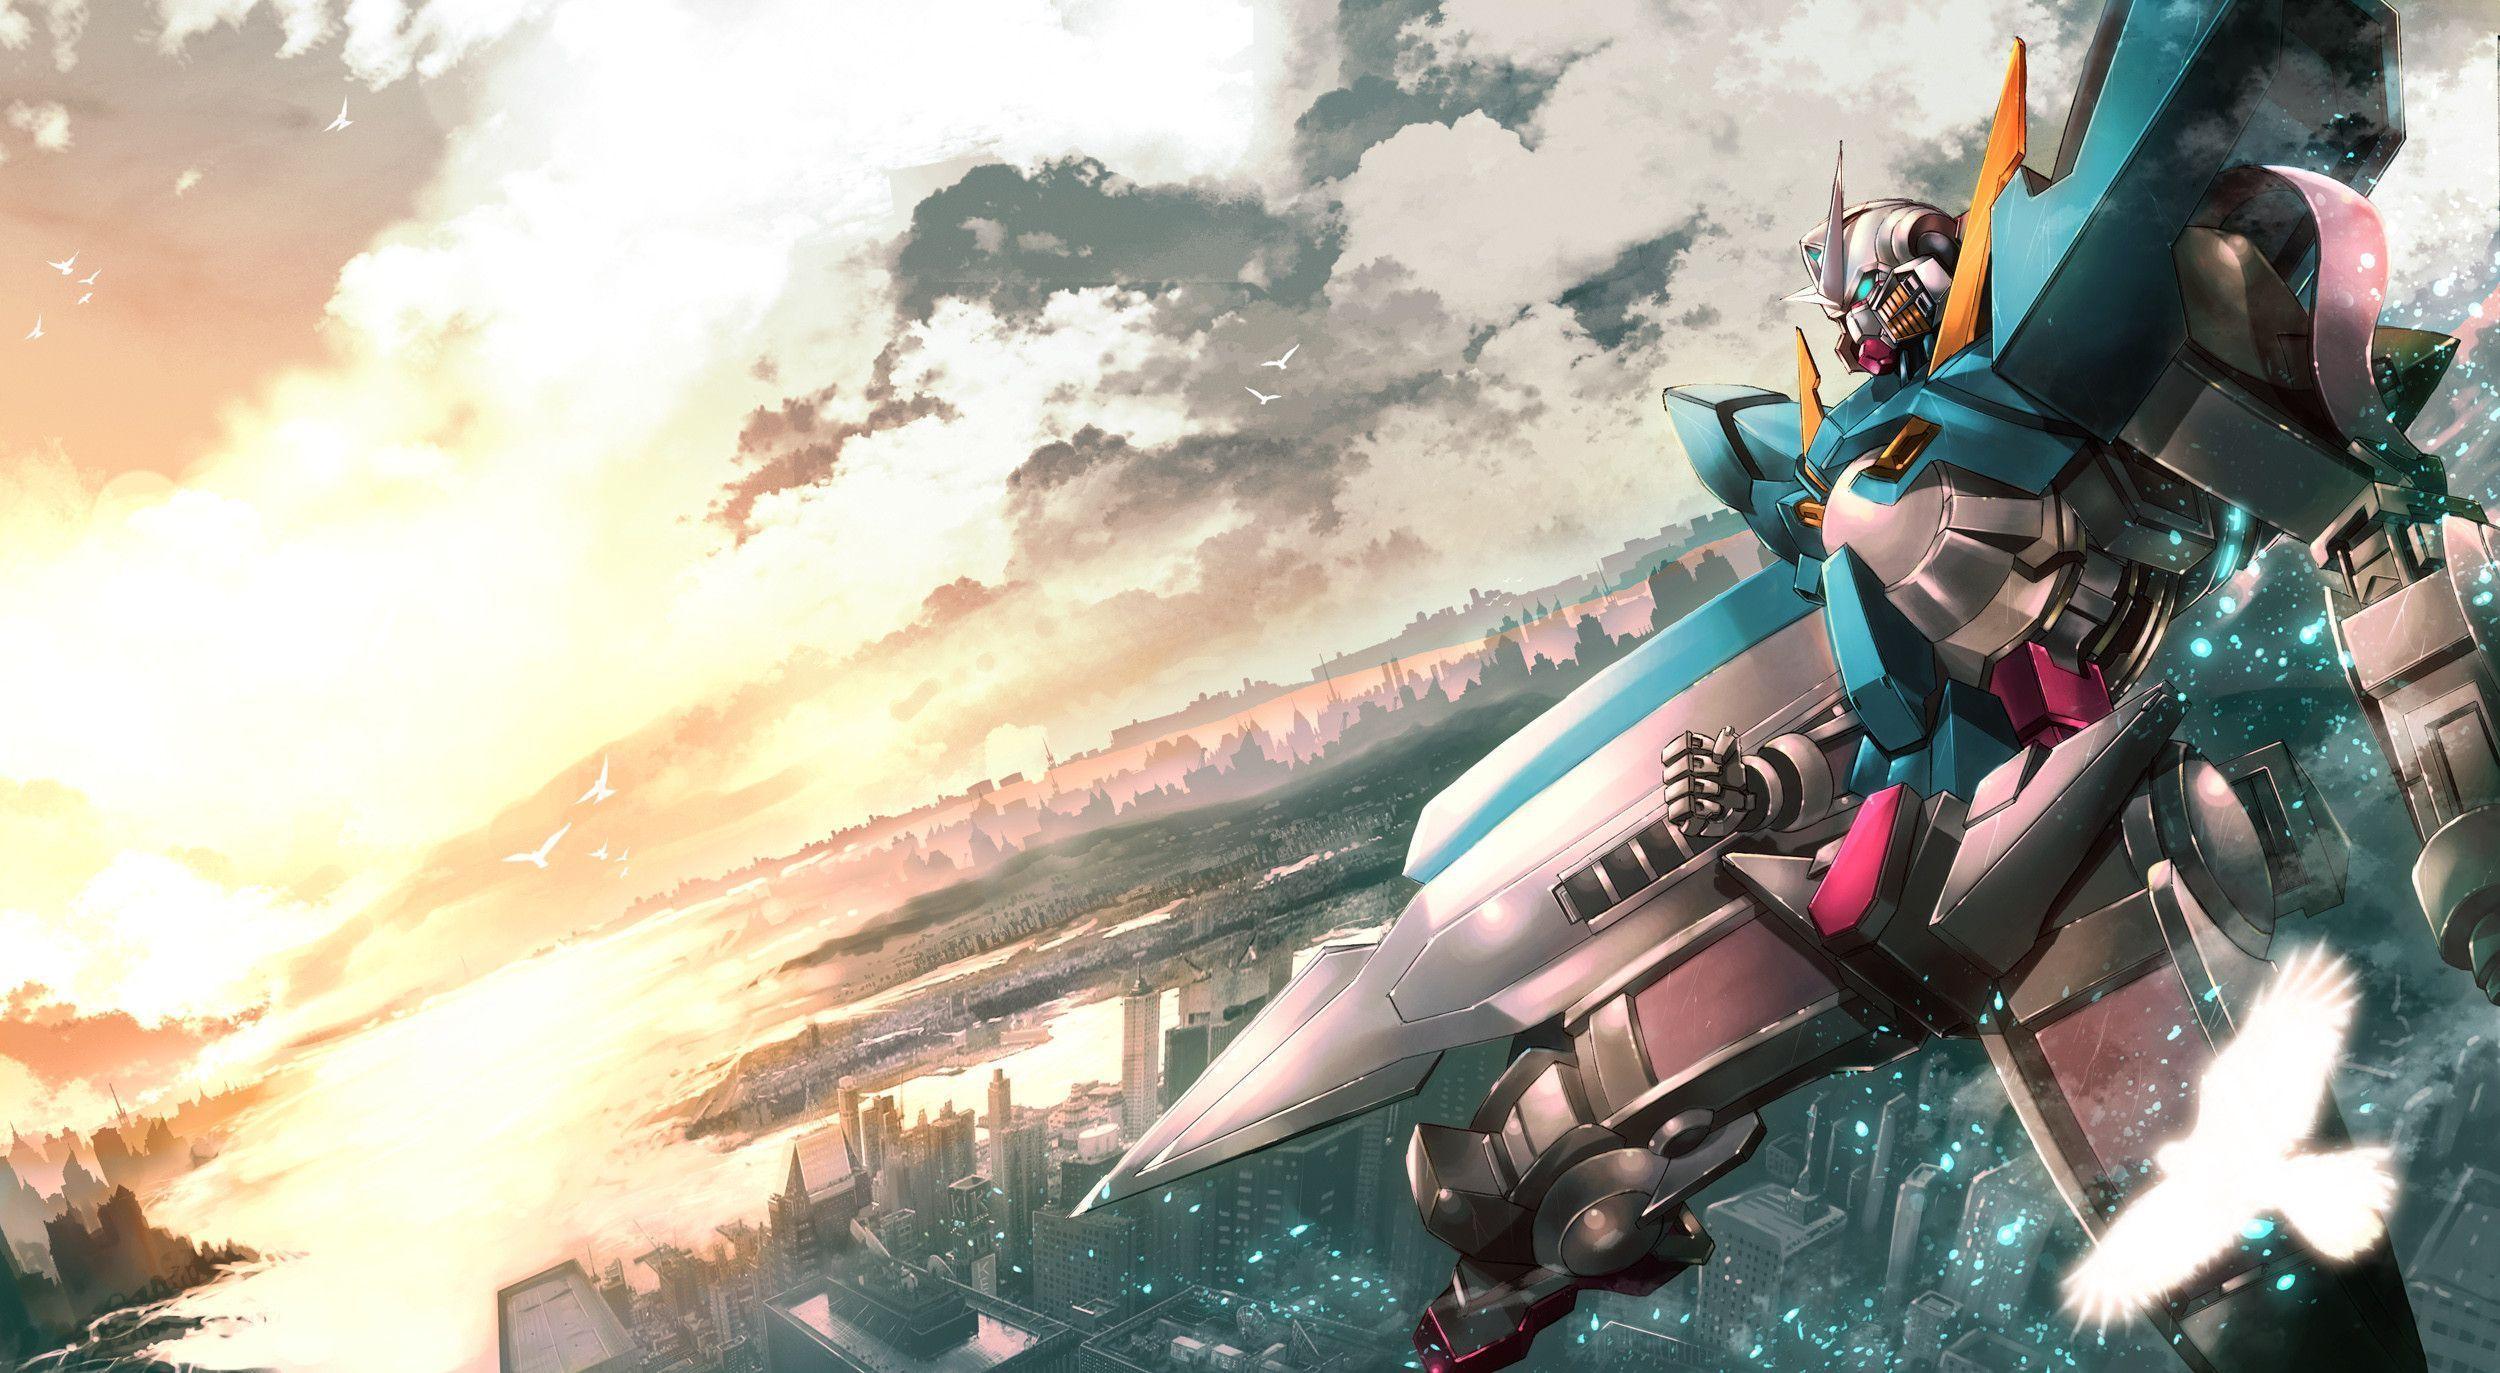 164 Gundam Wallpapers Gundam Backgrounds Gundam Wallpapers Gundam Exia Gundam